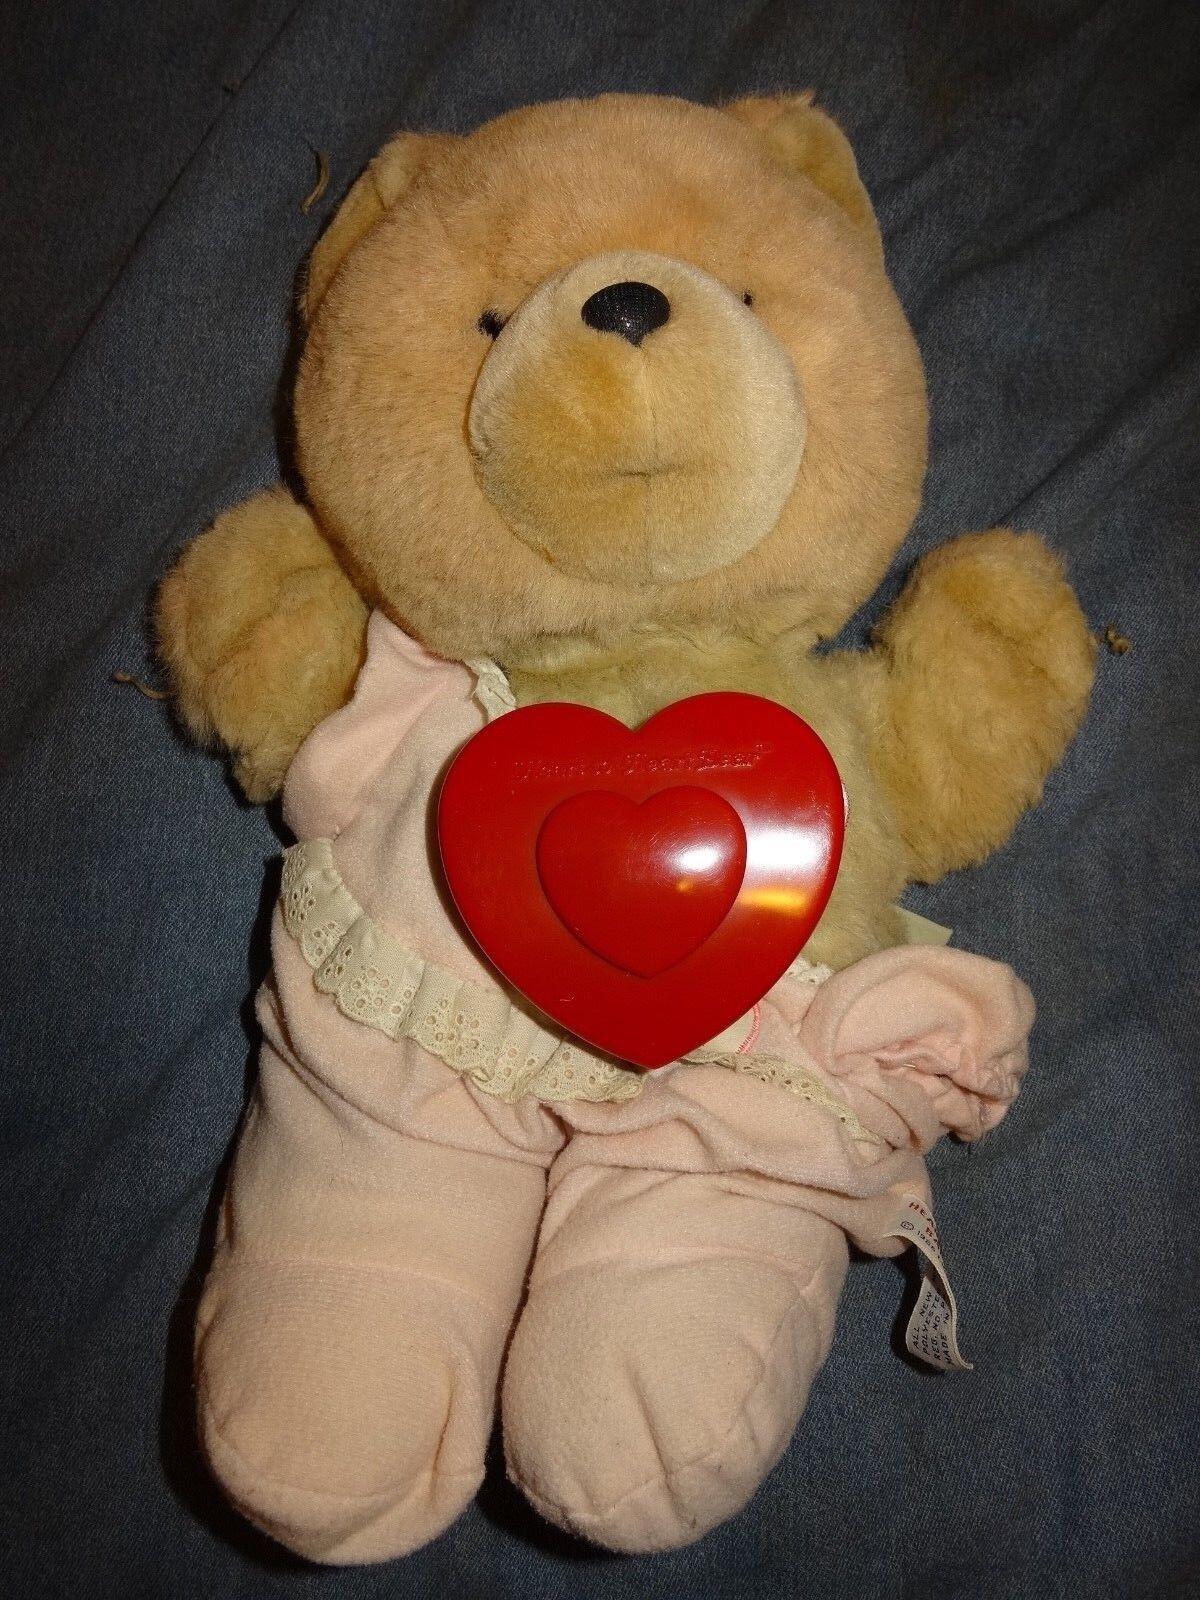 Chosun Heart to Heart Baby Bear Stuffed Plush Working Condition